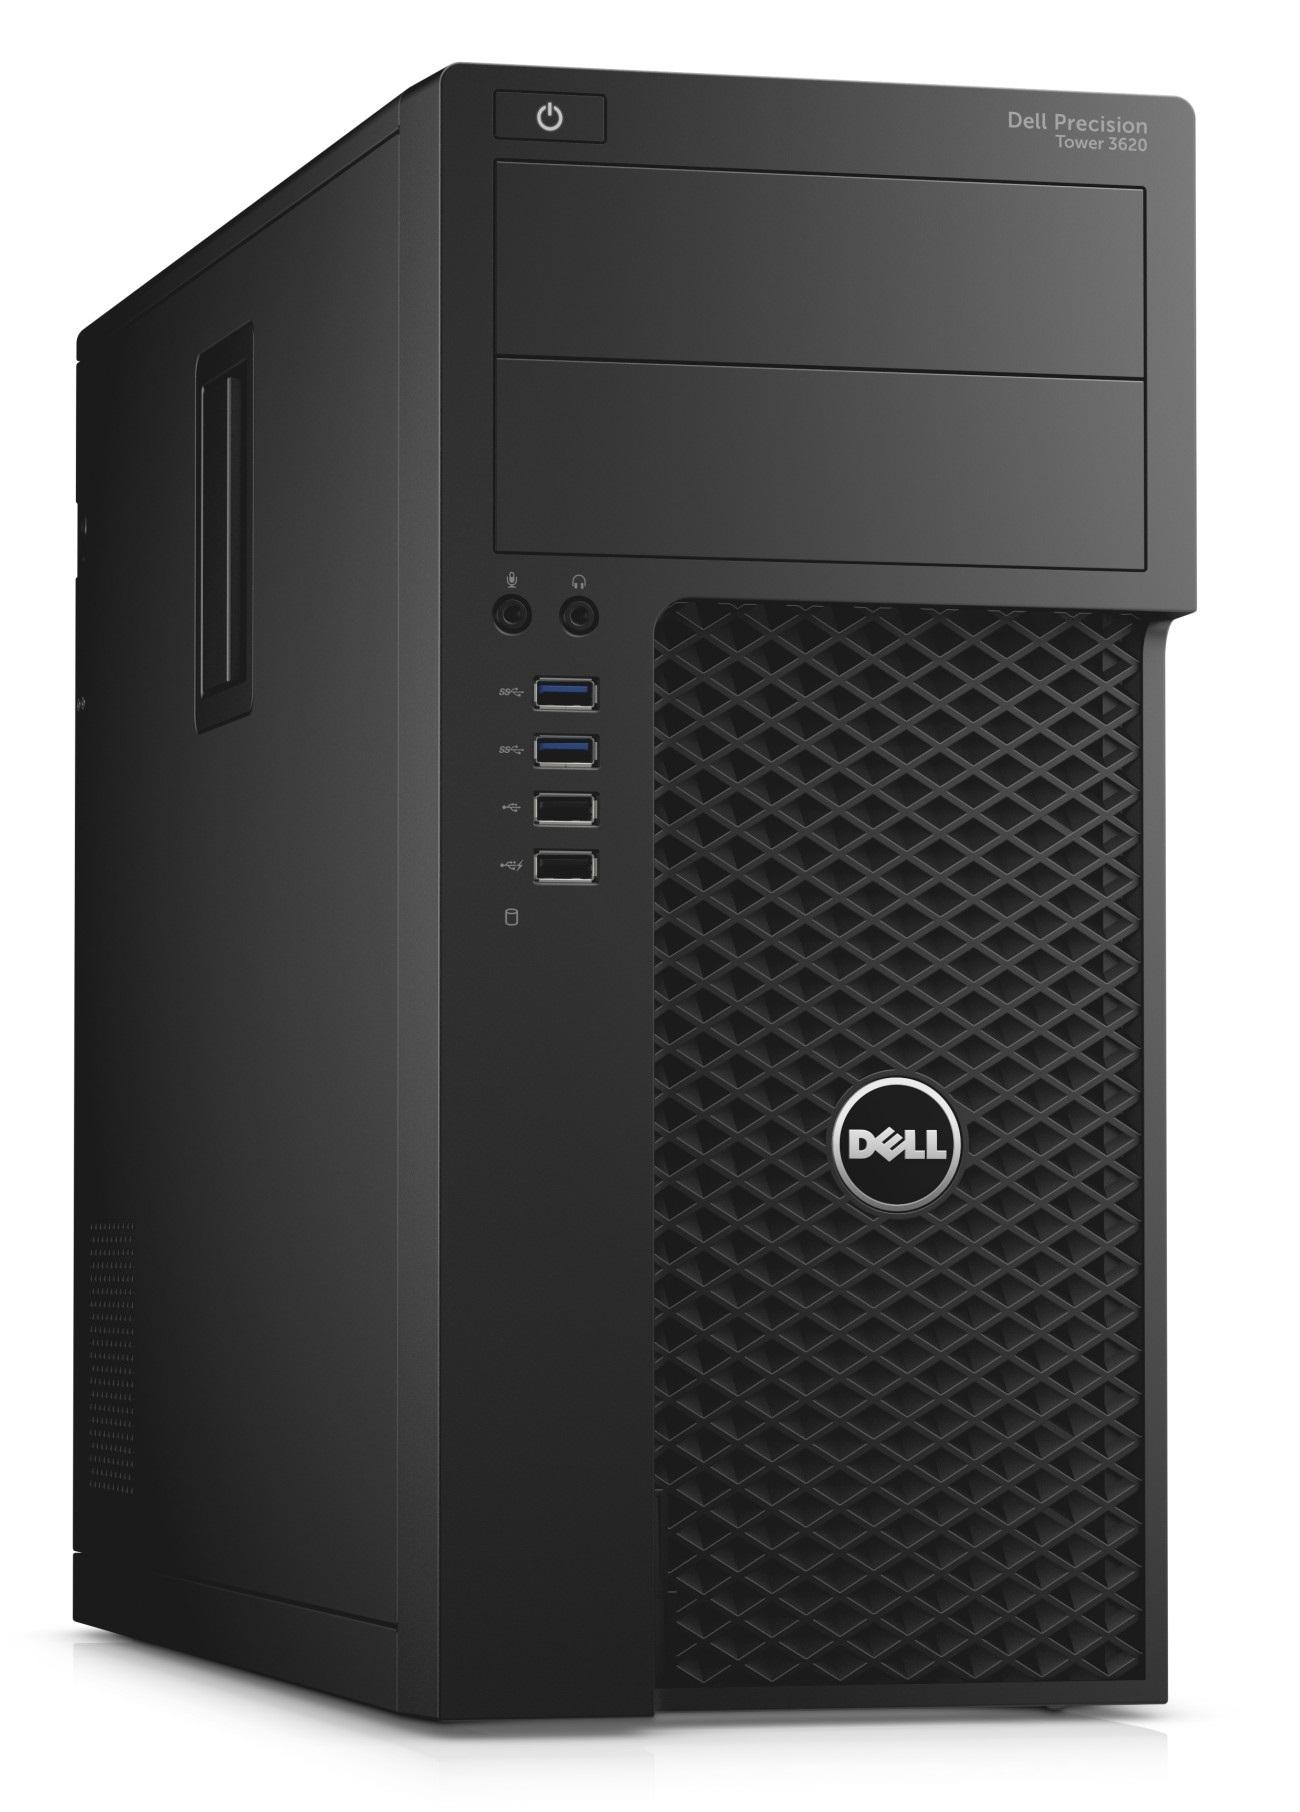 Dell Precision T3620 MT E3-1245/16G/1TB/M4000-8G/DP/W7P+W10P/3R NBD